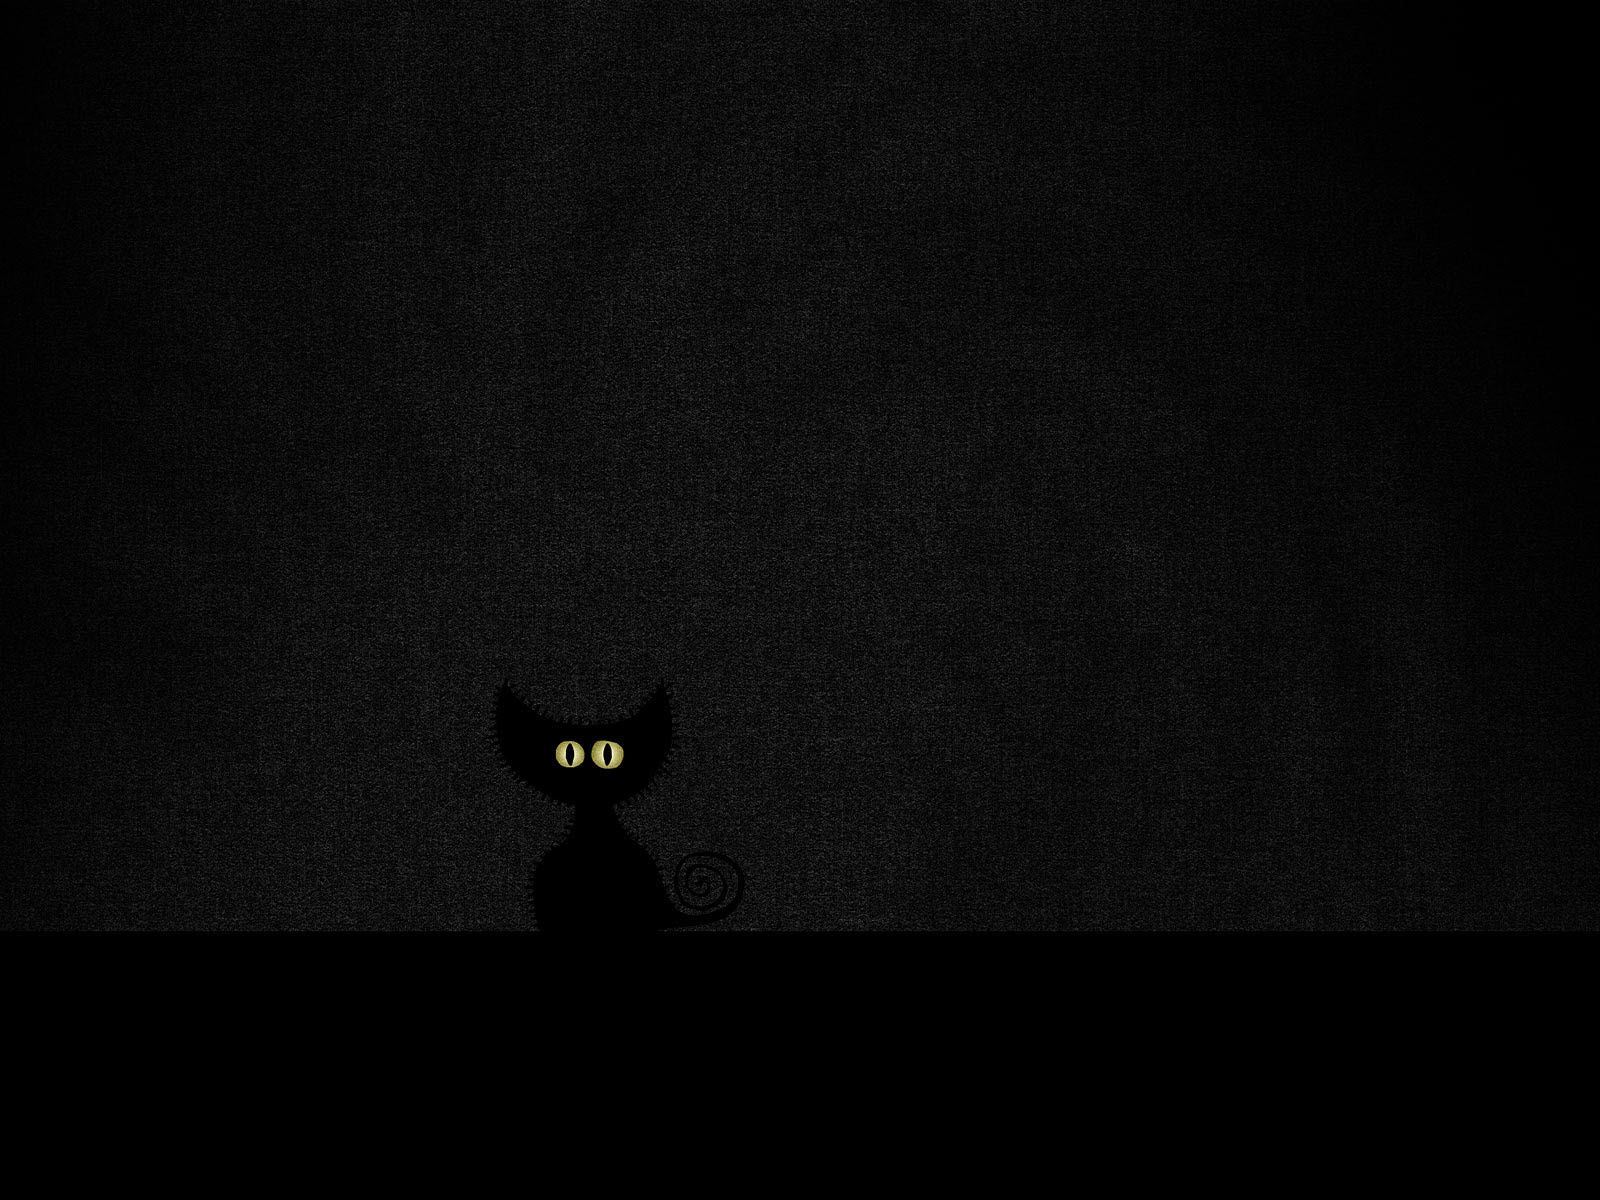 black background black cat image hd wallpaper